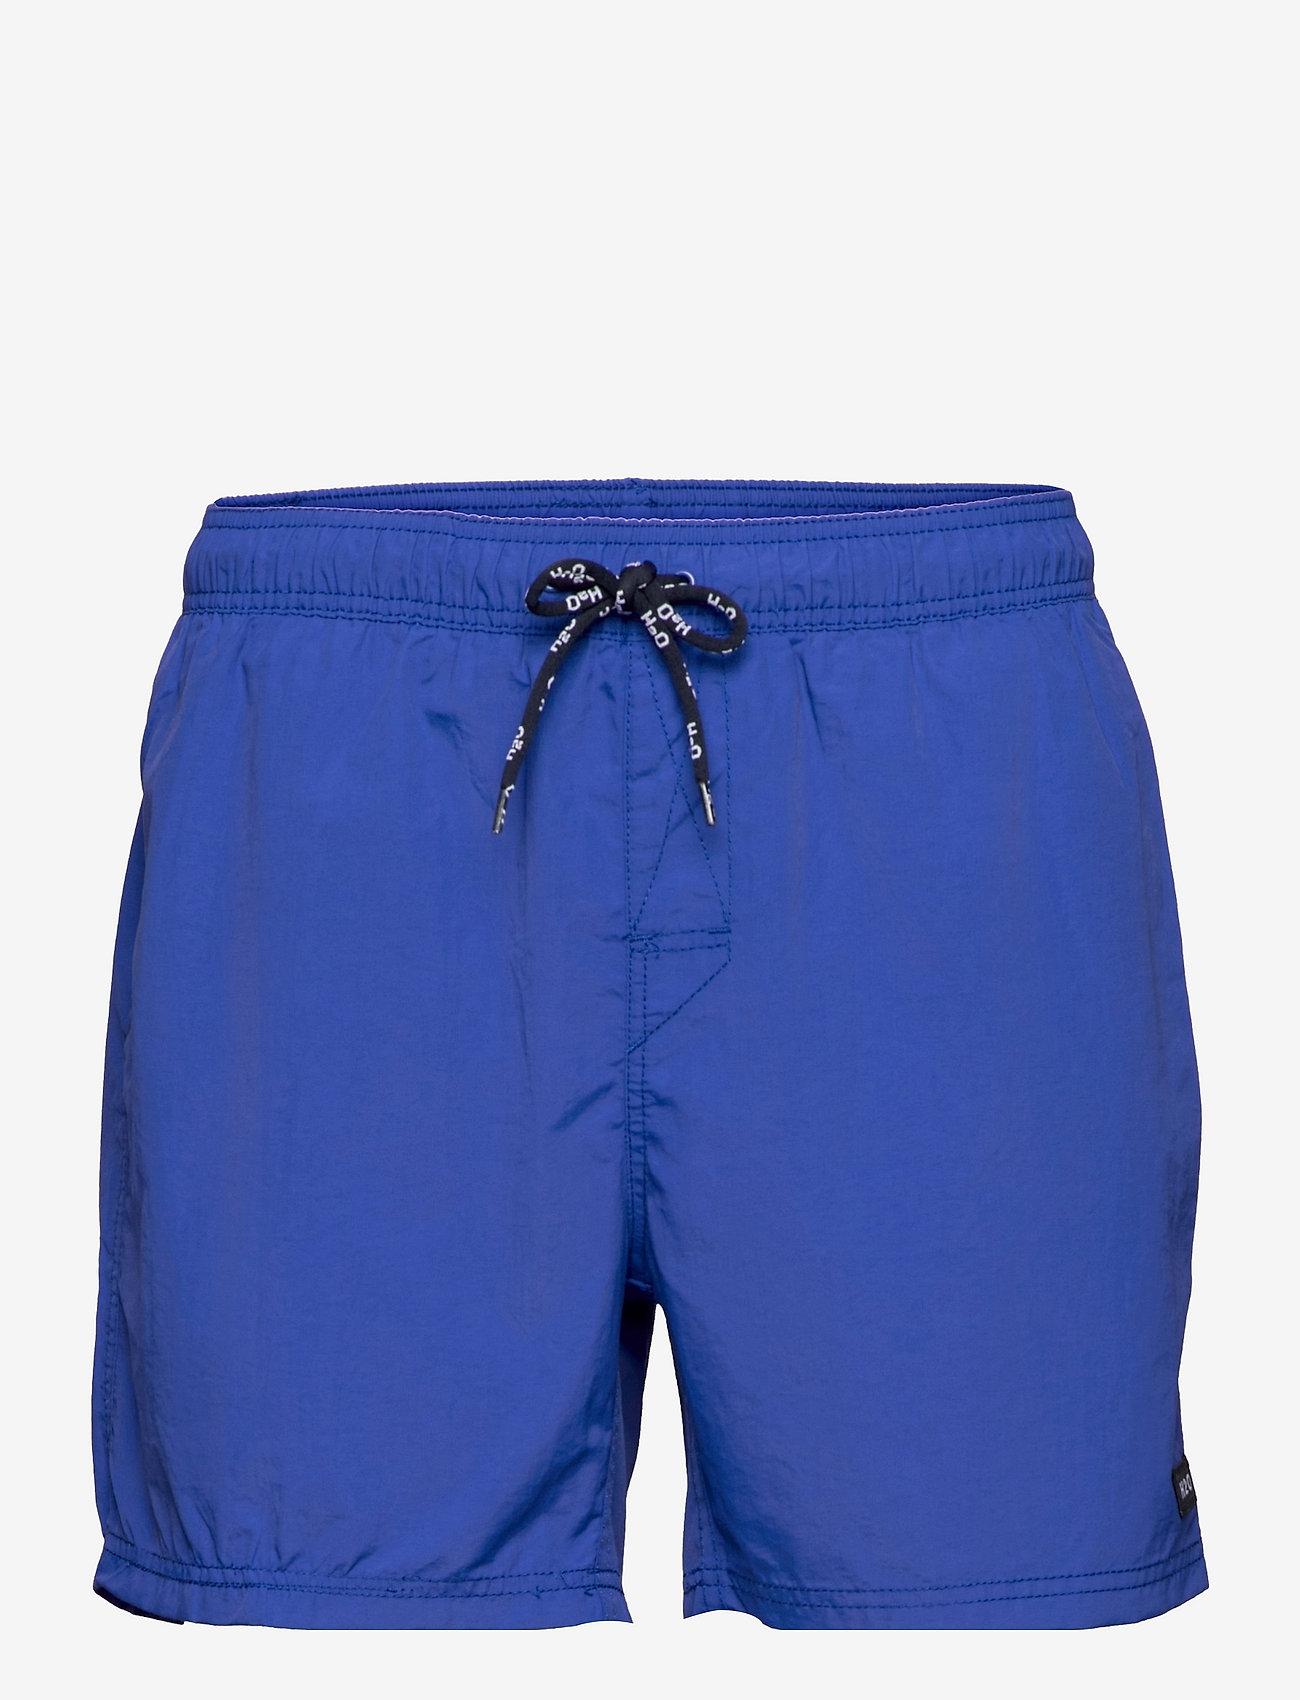 H2O - Leisure Swim Shorts - uimashortsit - surf blue - 0